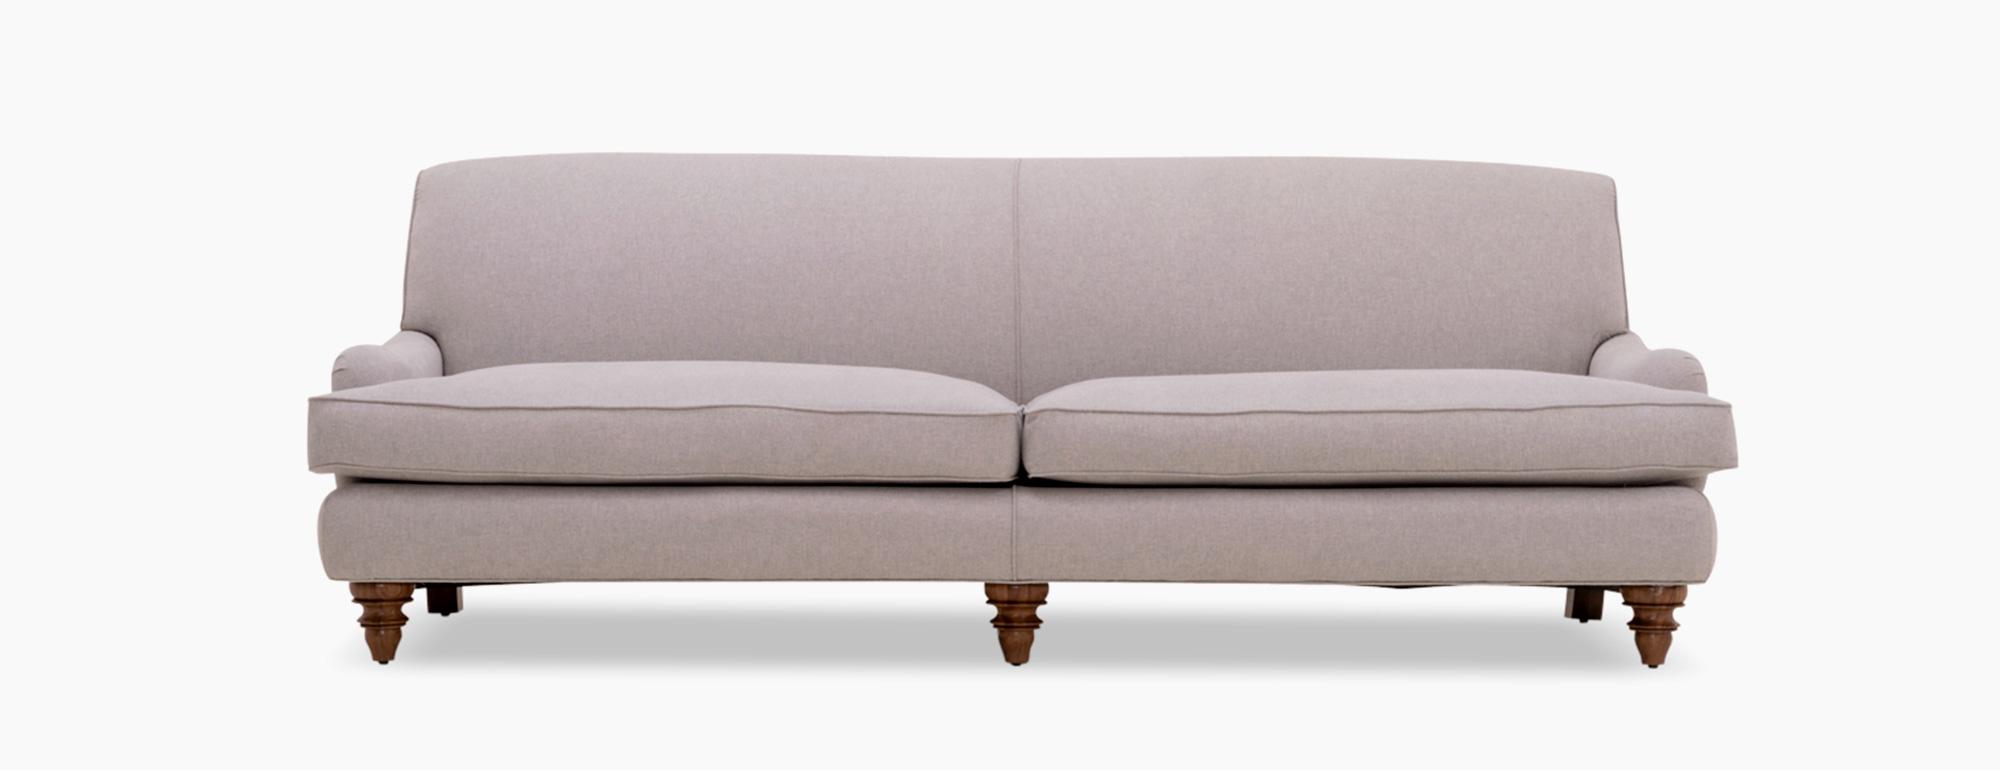 hero-robin-sofa-1